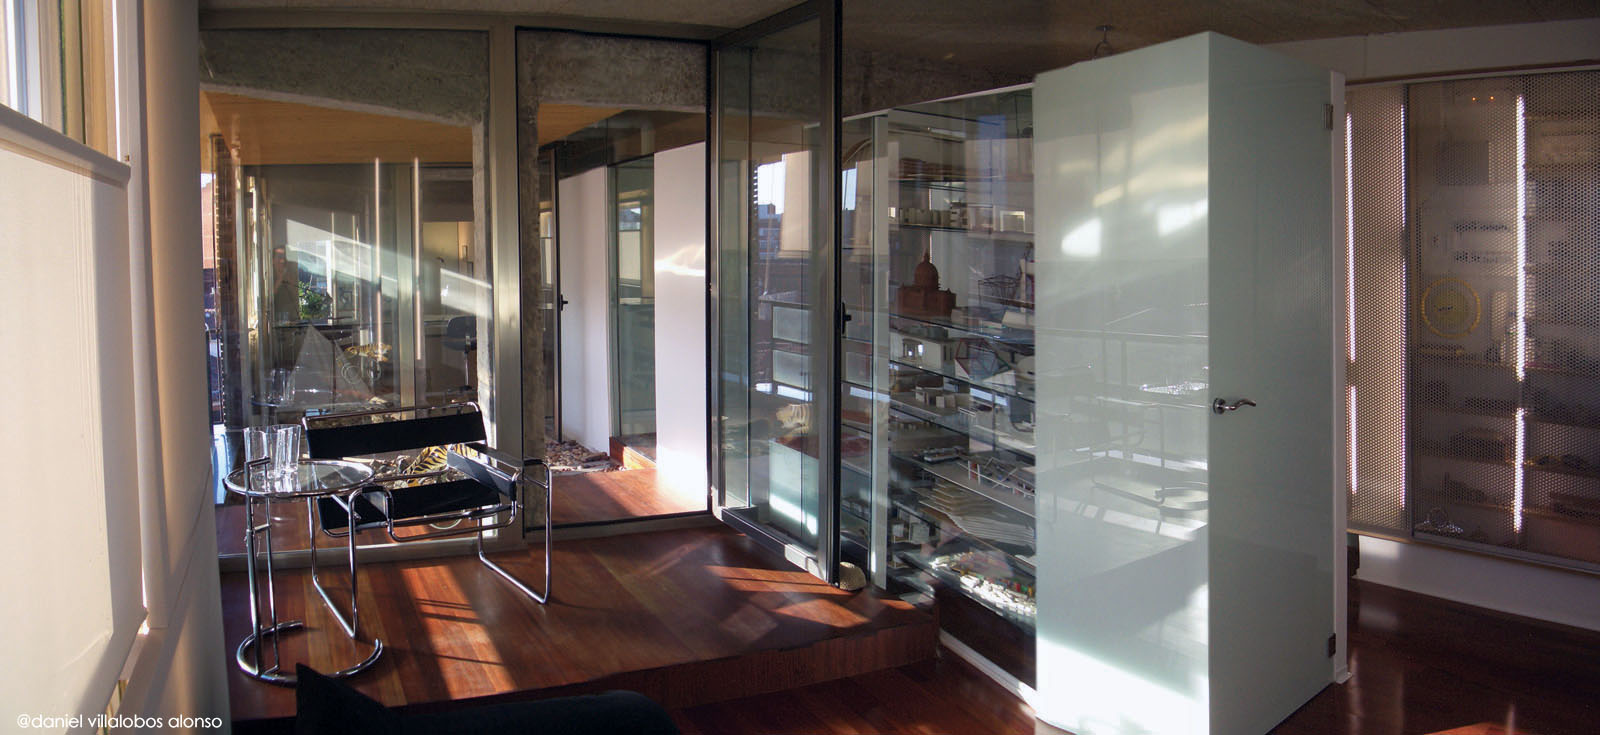 danielvillalobos-architecturexxithcentury-spanisharchitecture-11